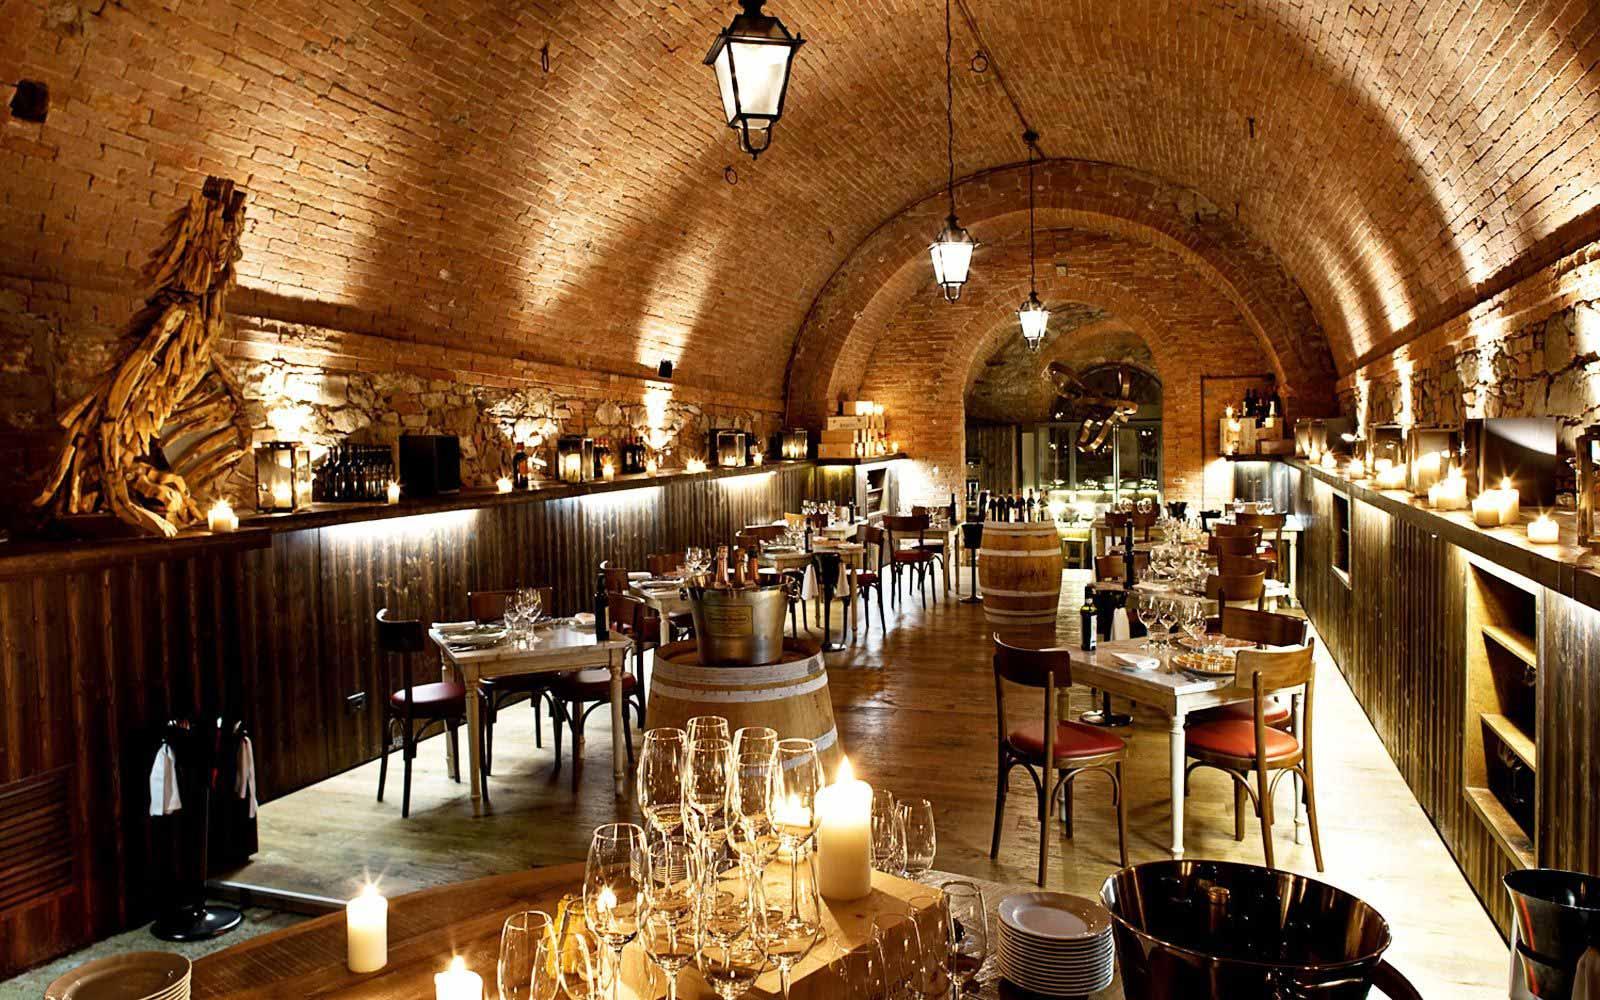 La Cantina Restaurant at Castel Monastero Tuscan Resort & Spa